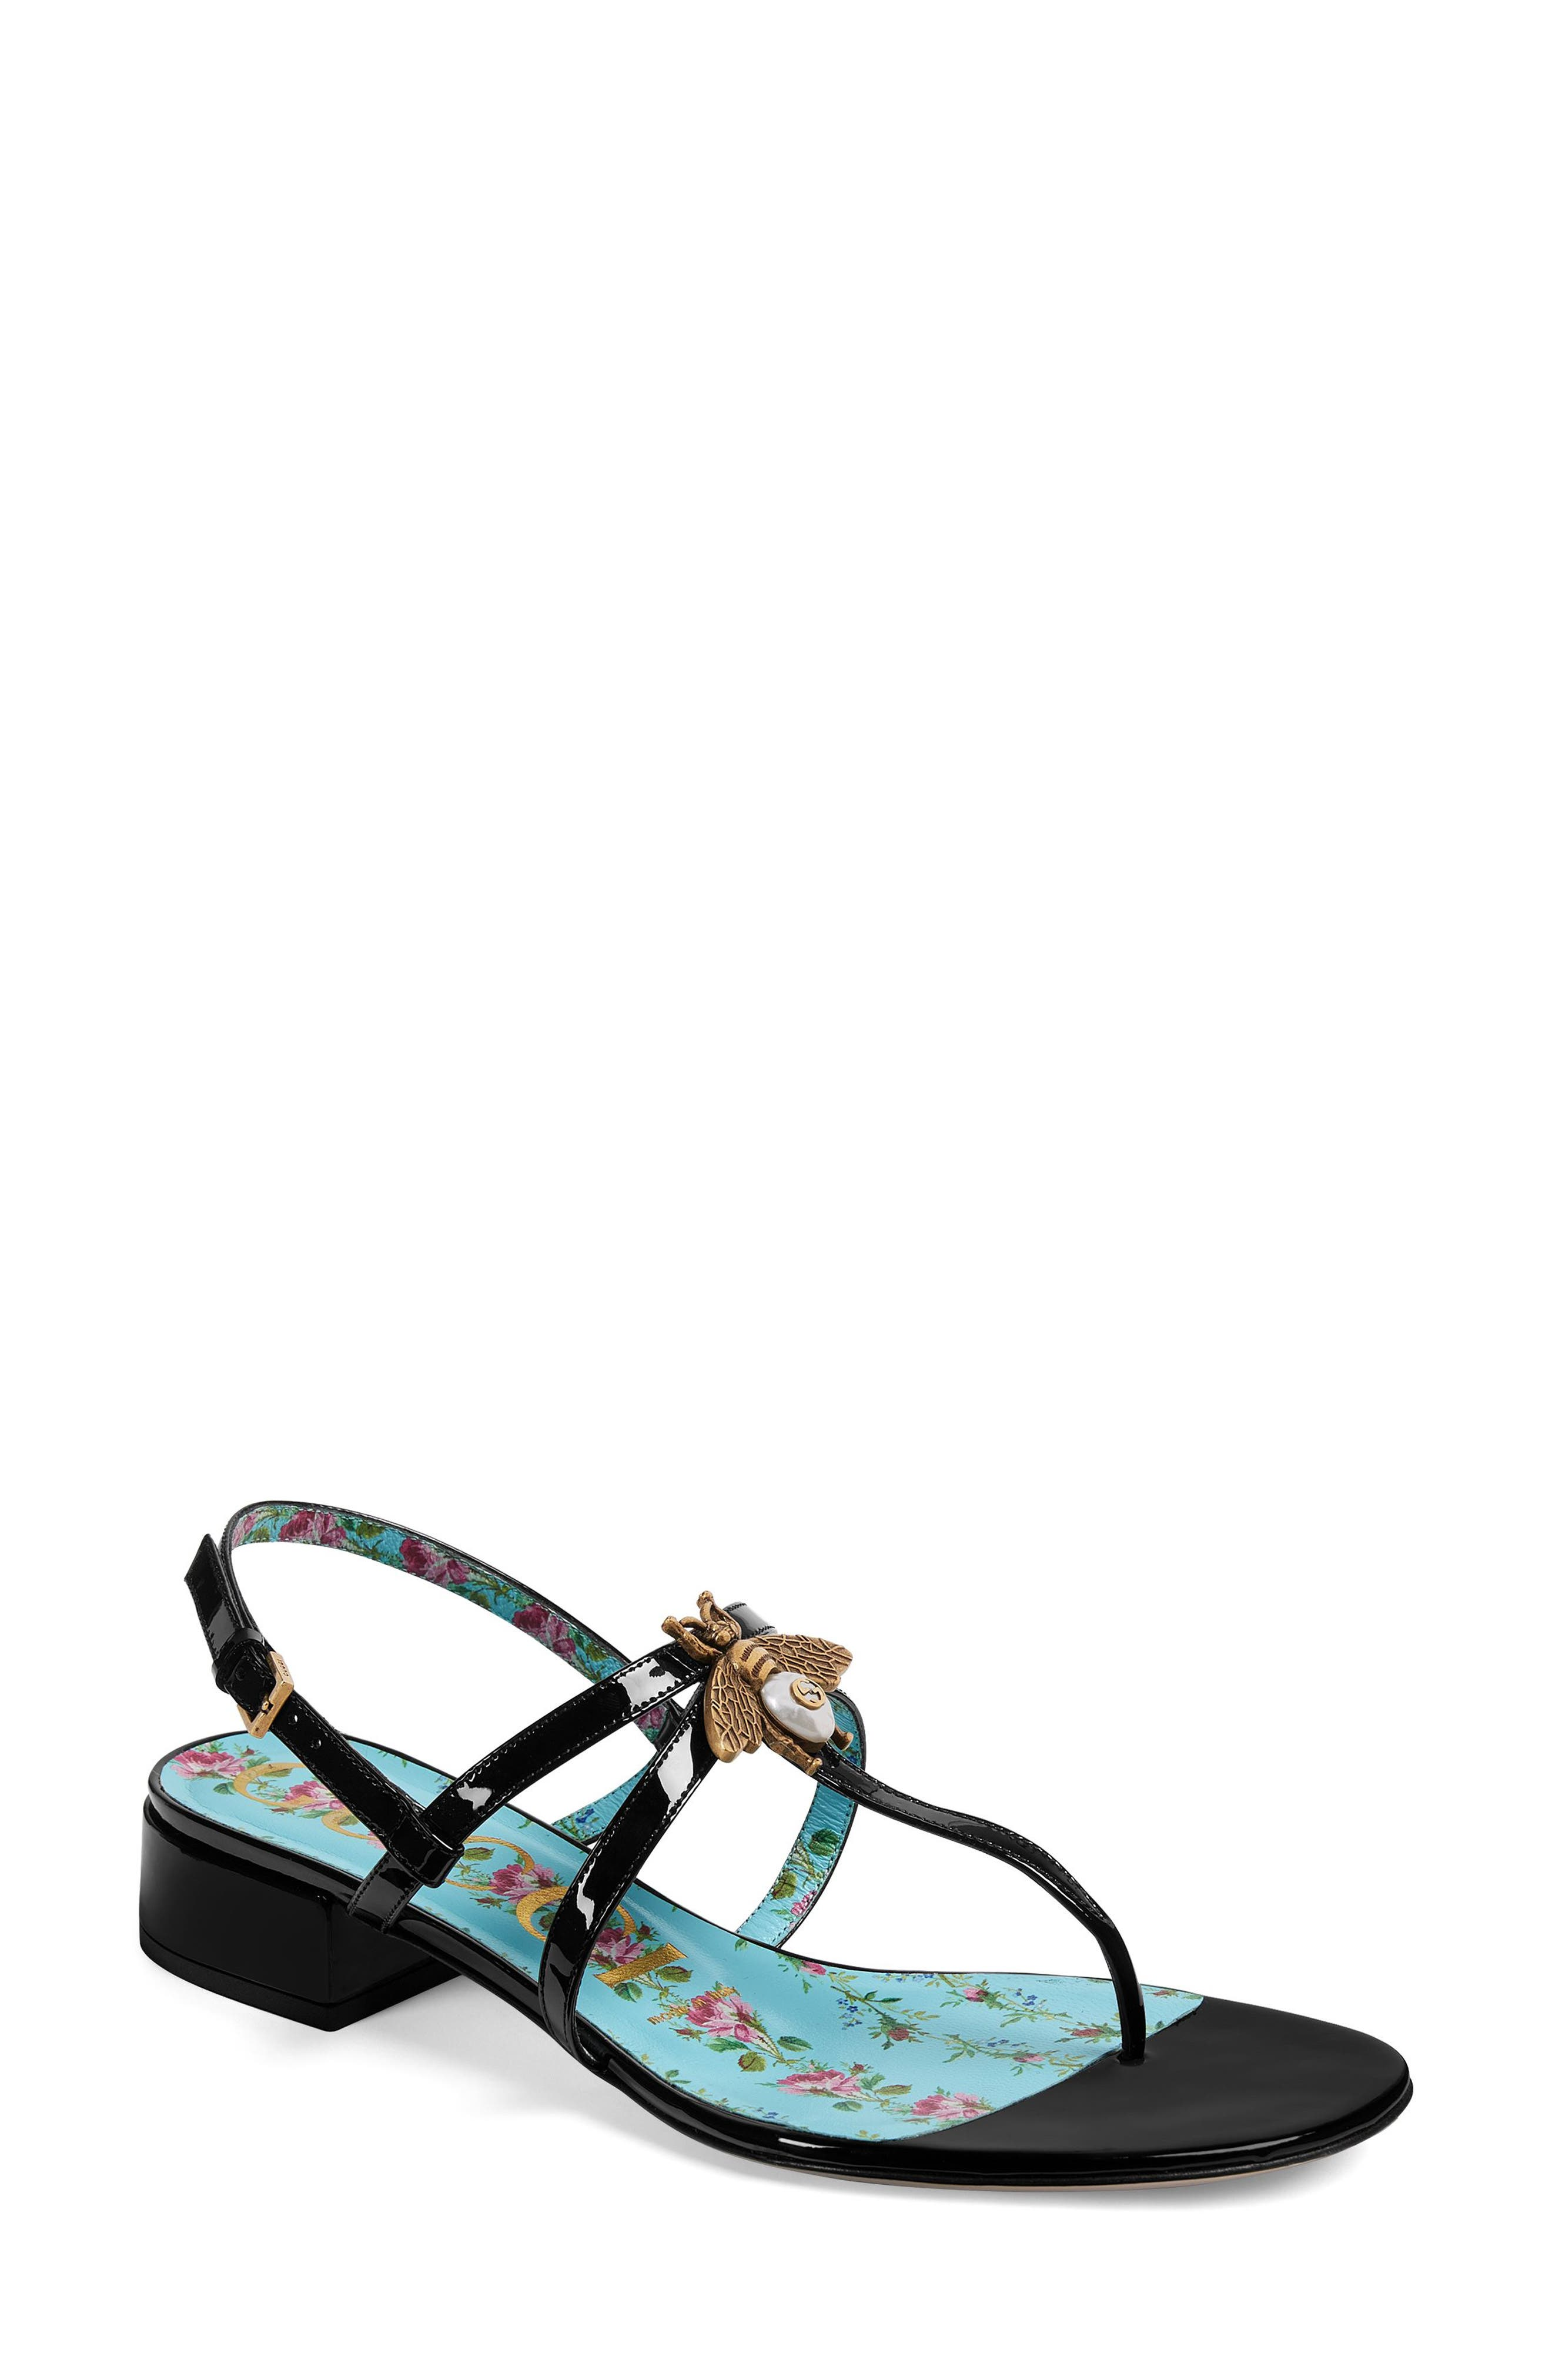 Bee Thong Sandal,                         Main,                         color, Black